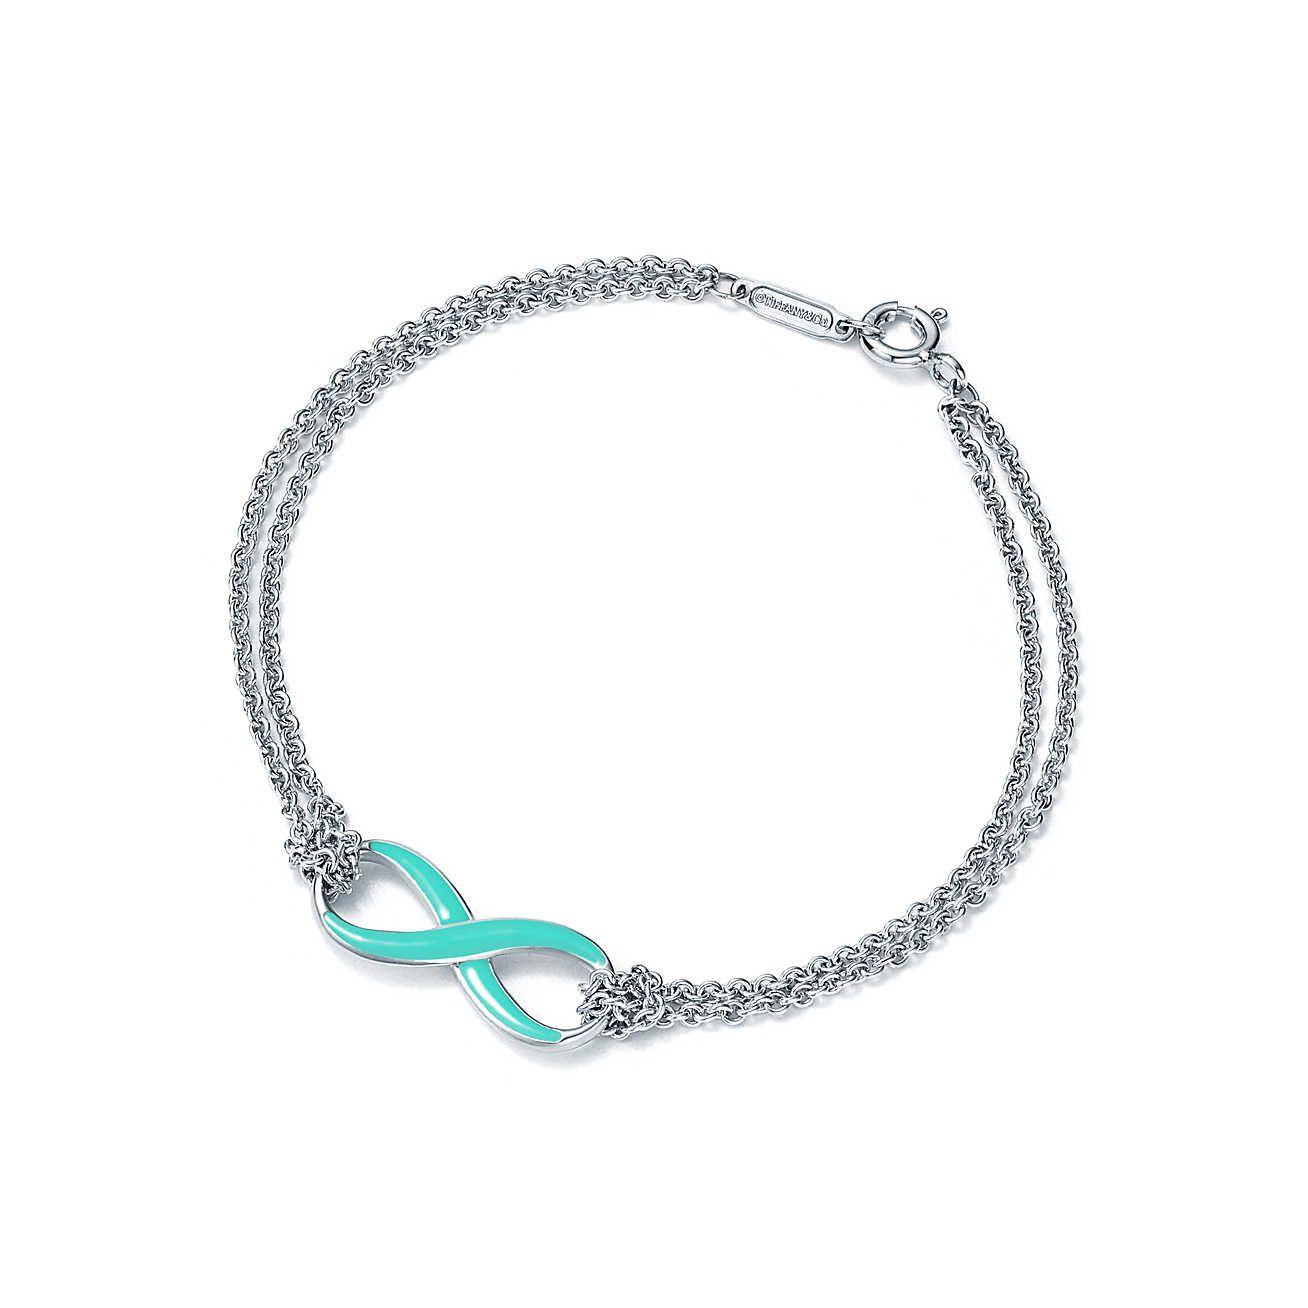 9b286a55d Tiffany Infinity bracelet in silver with Tiffany Blue® enamel finish,  medium.